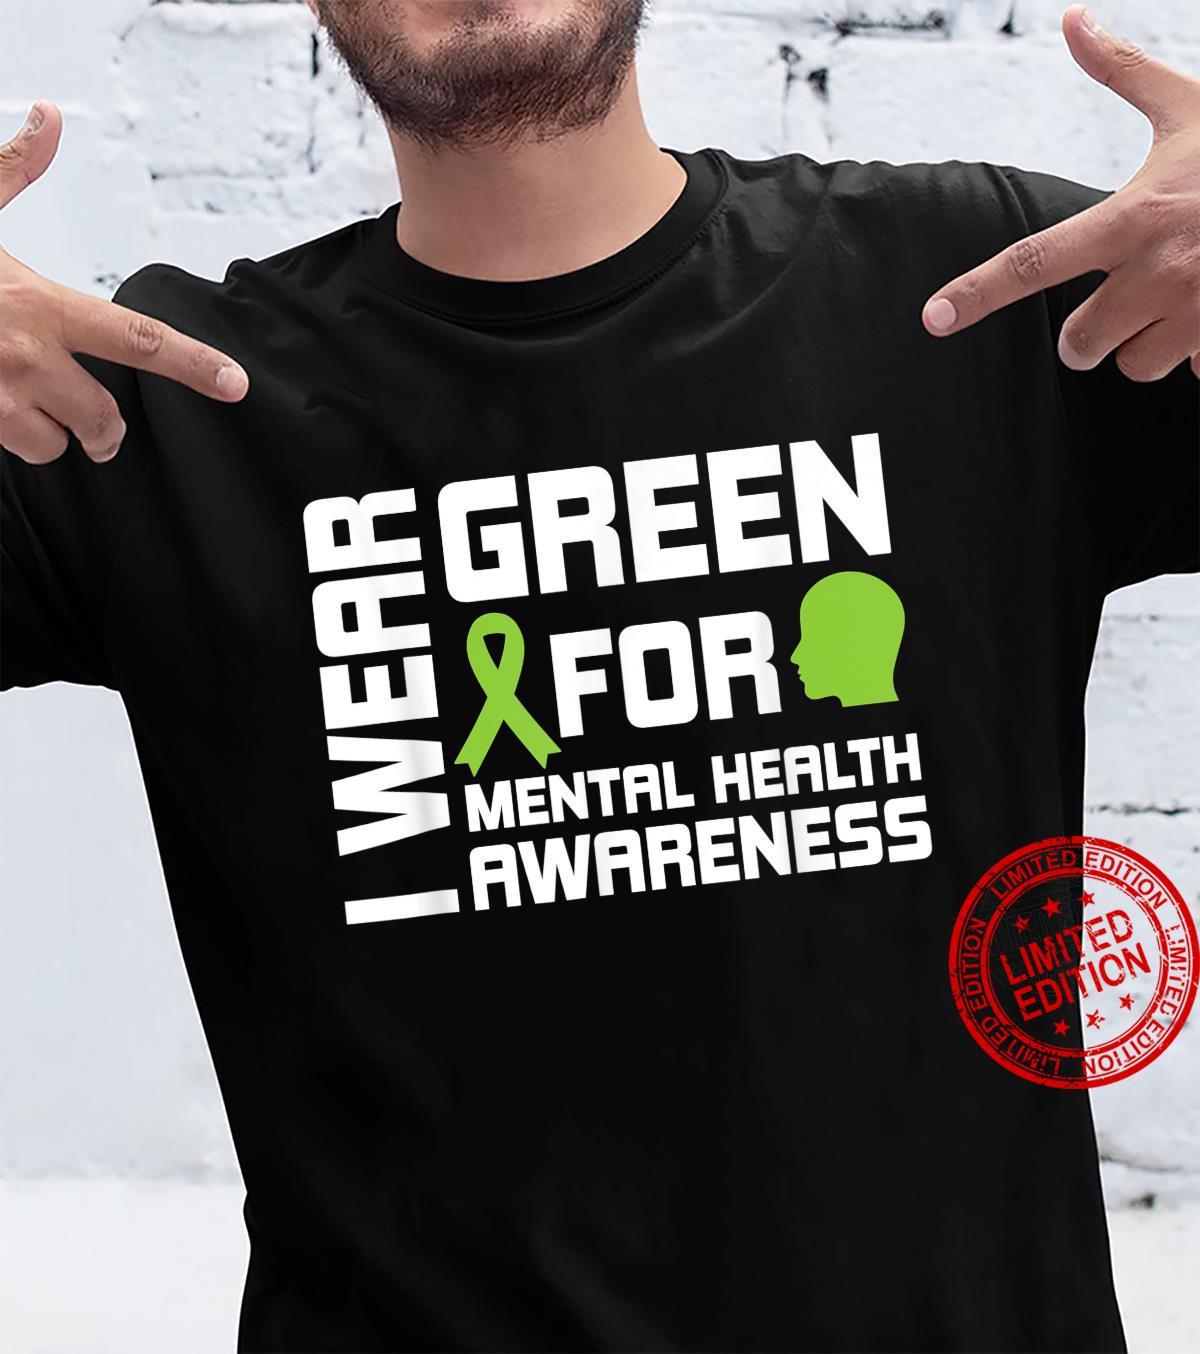 I Wear Greental Health Awareness Shirt